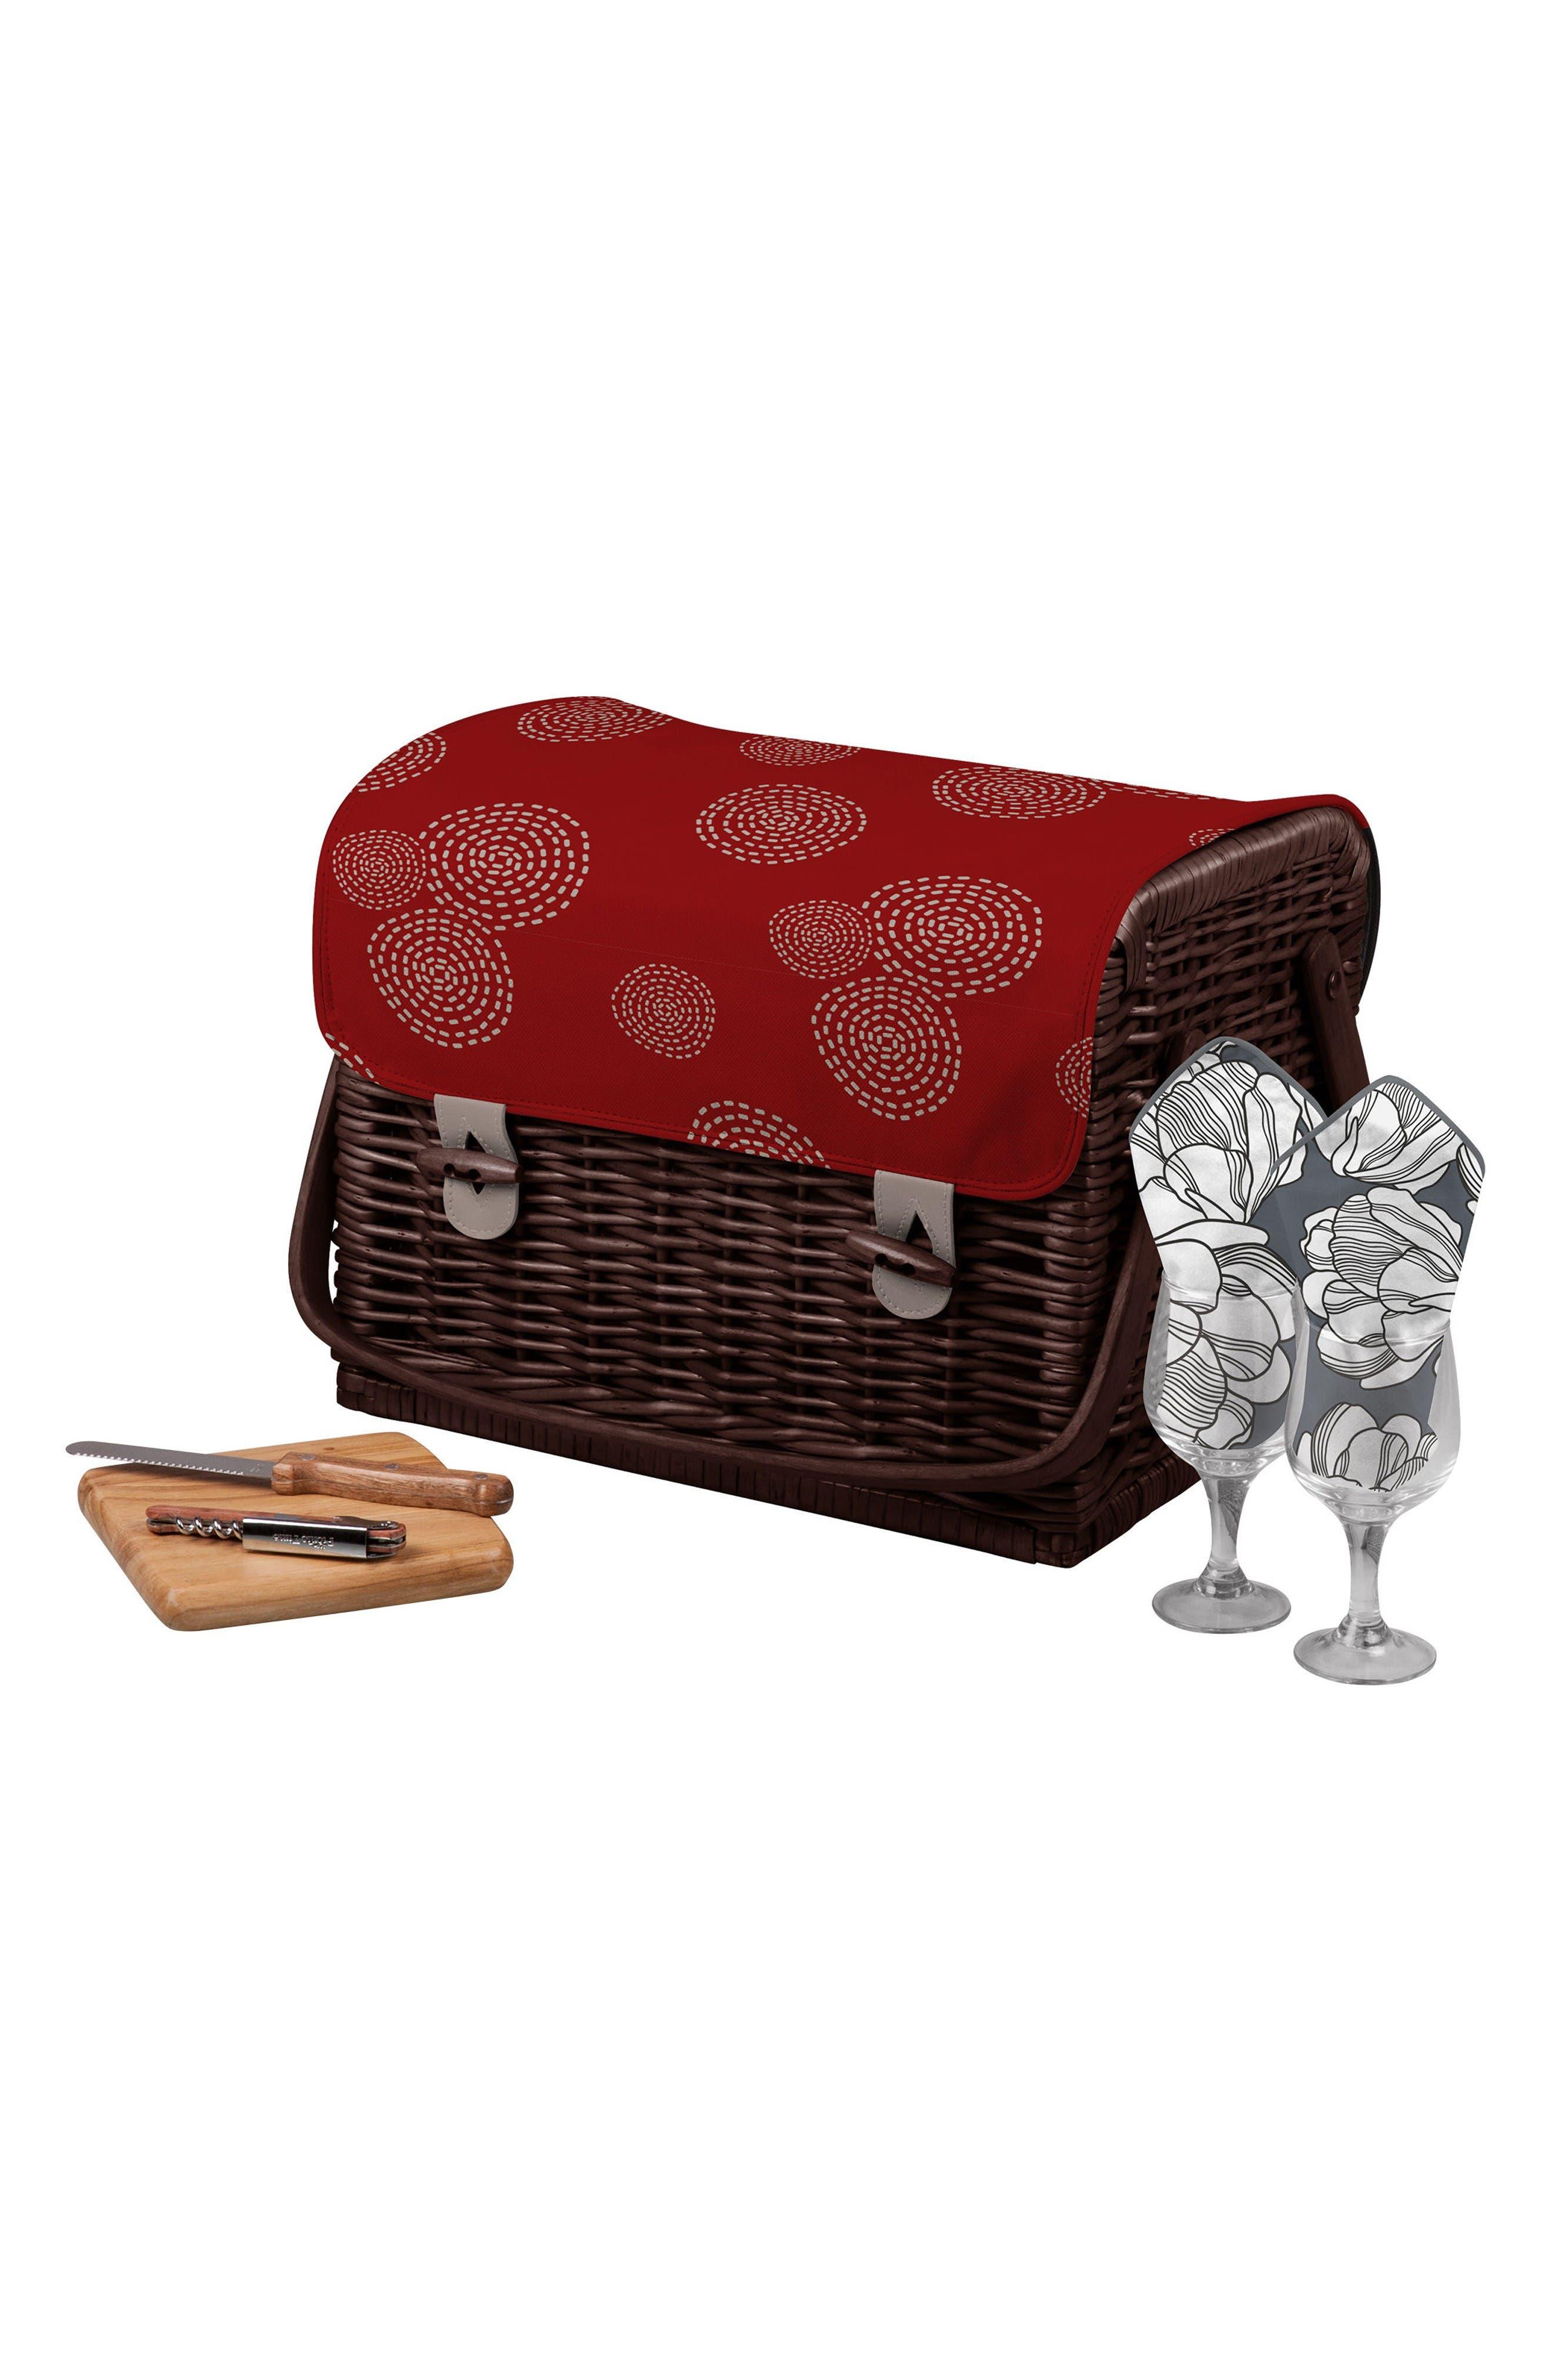 Main Image - Picnic Time Kabrio Wine & Cheese Picnic Basket